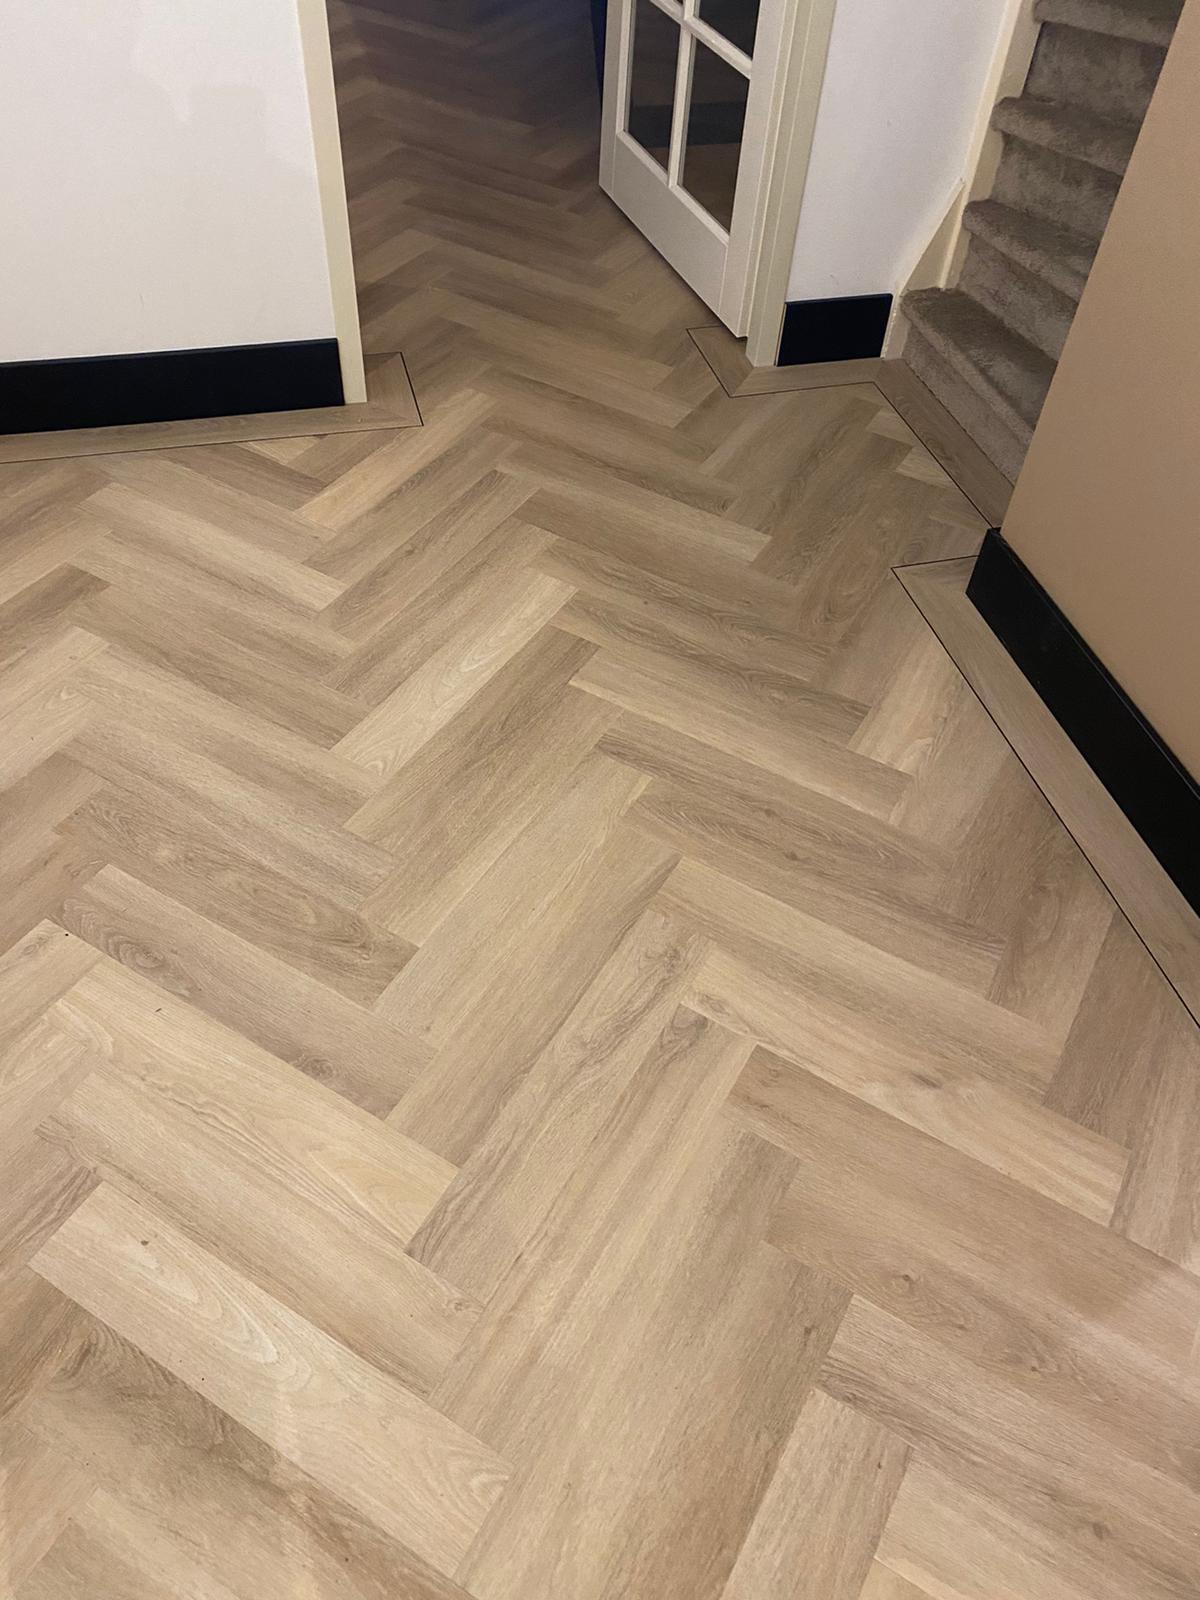 Project visgraat vloer bacovloeren detail hal